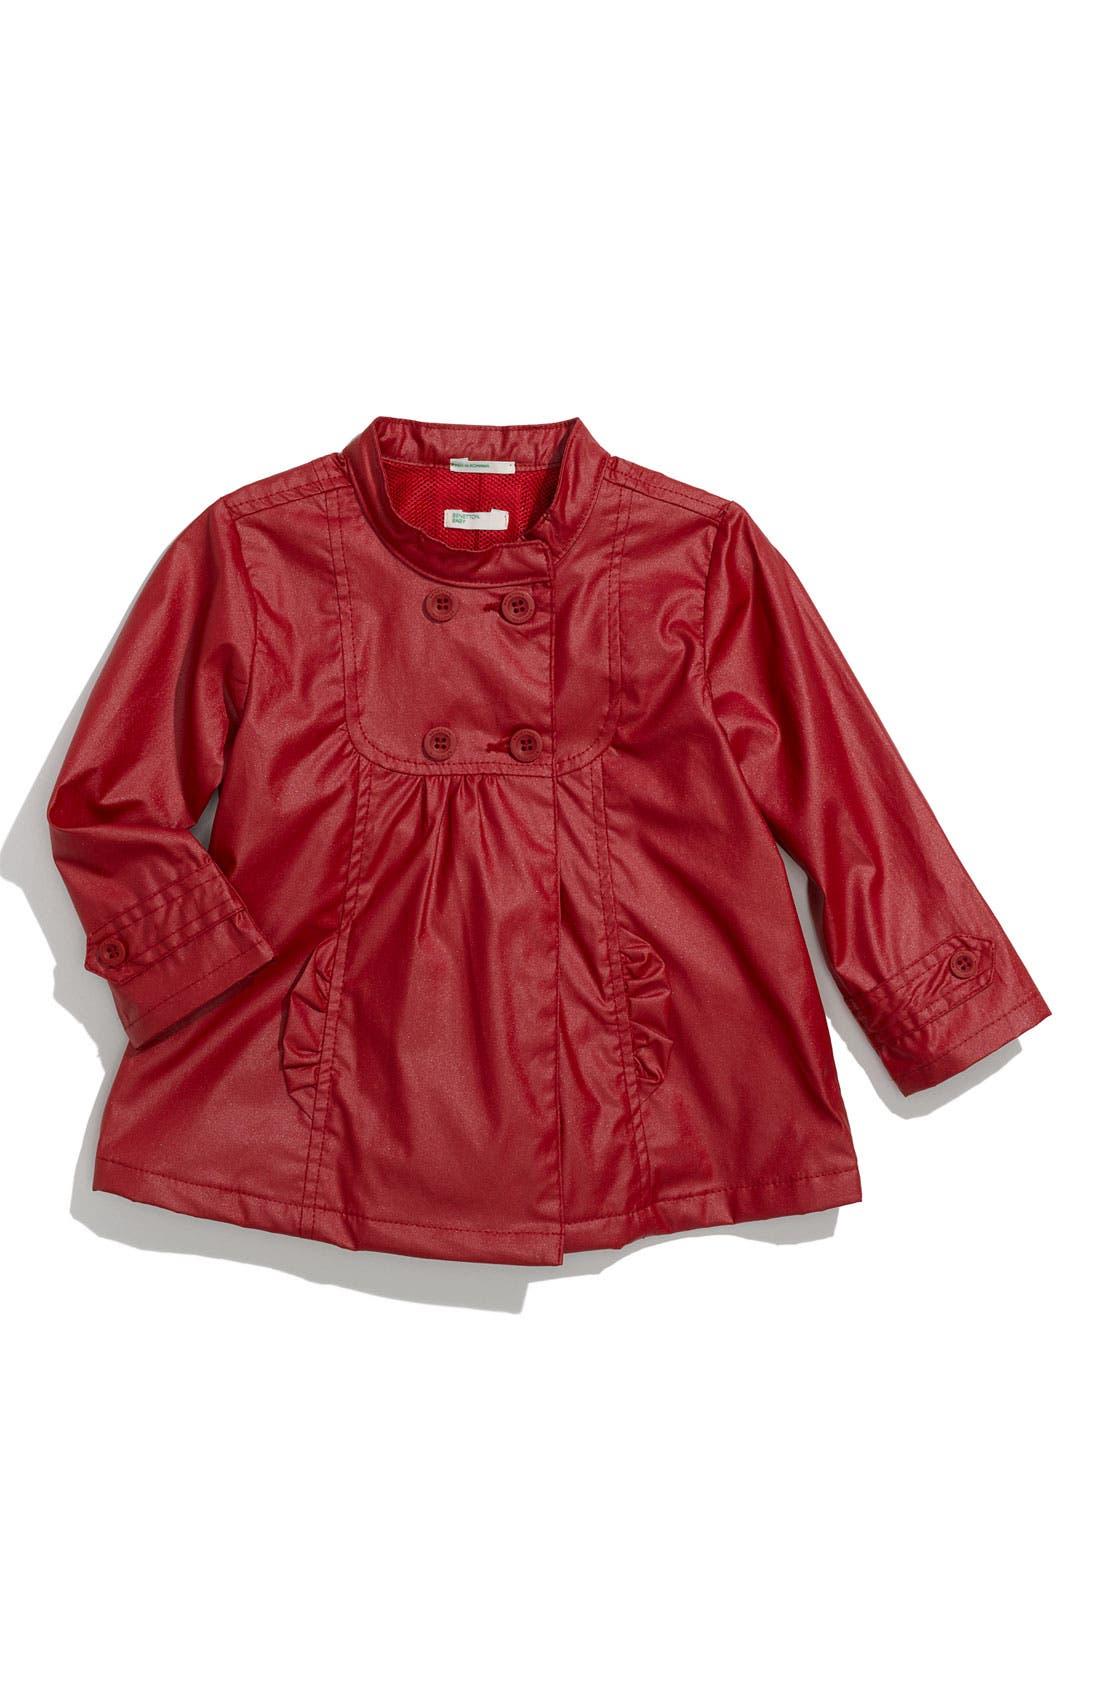 Main Image - United Colors of Benetton Kids Raincoat (Infant)